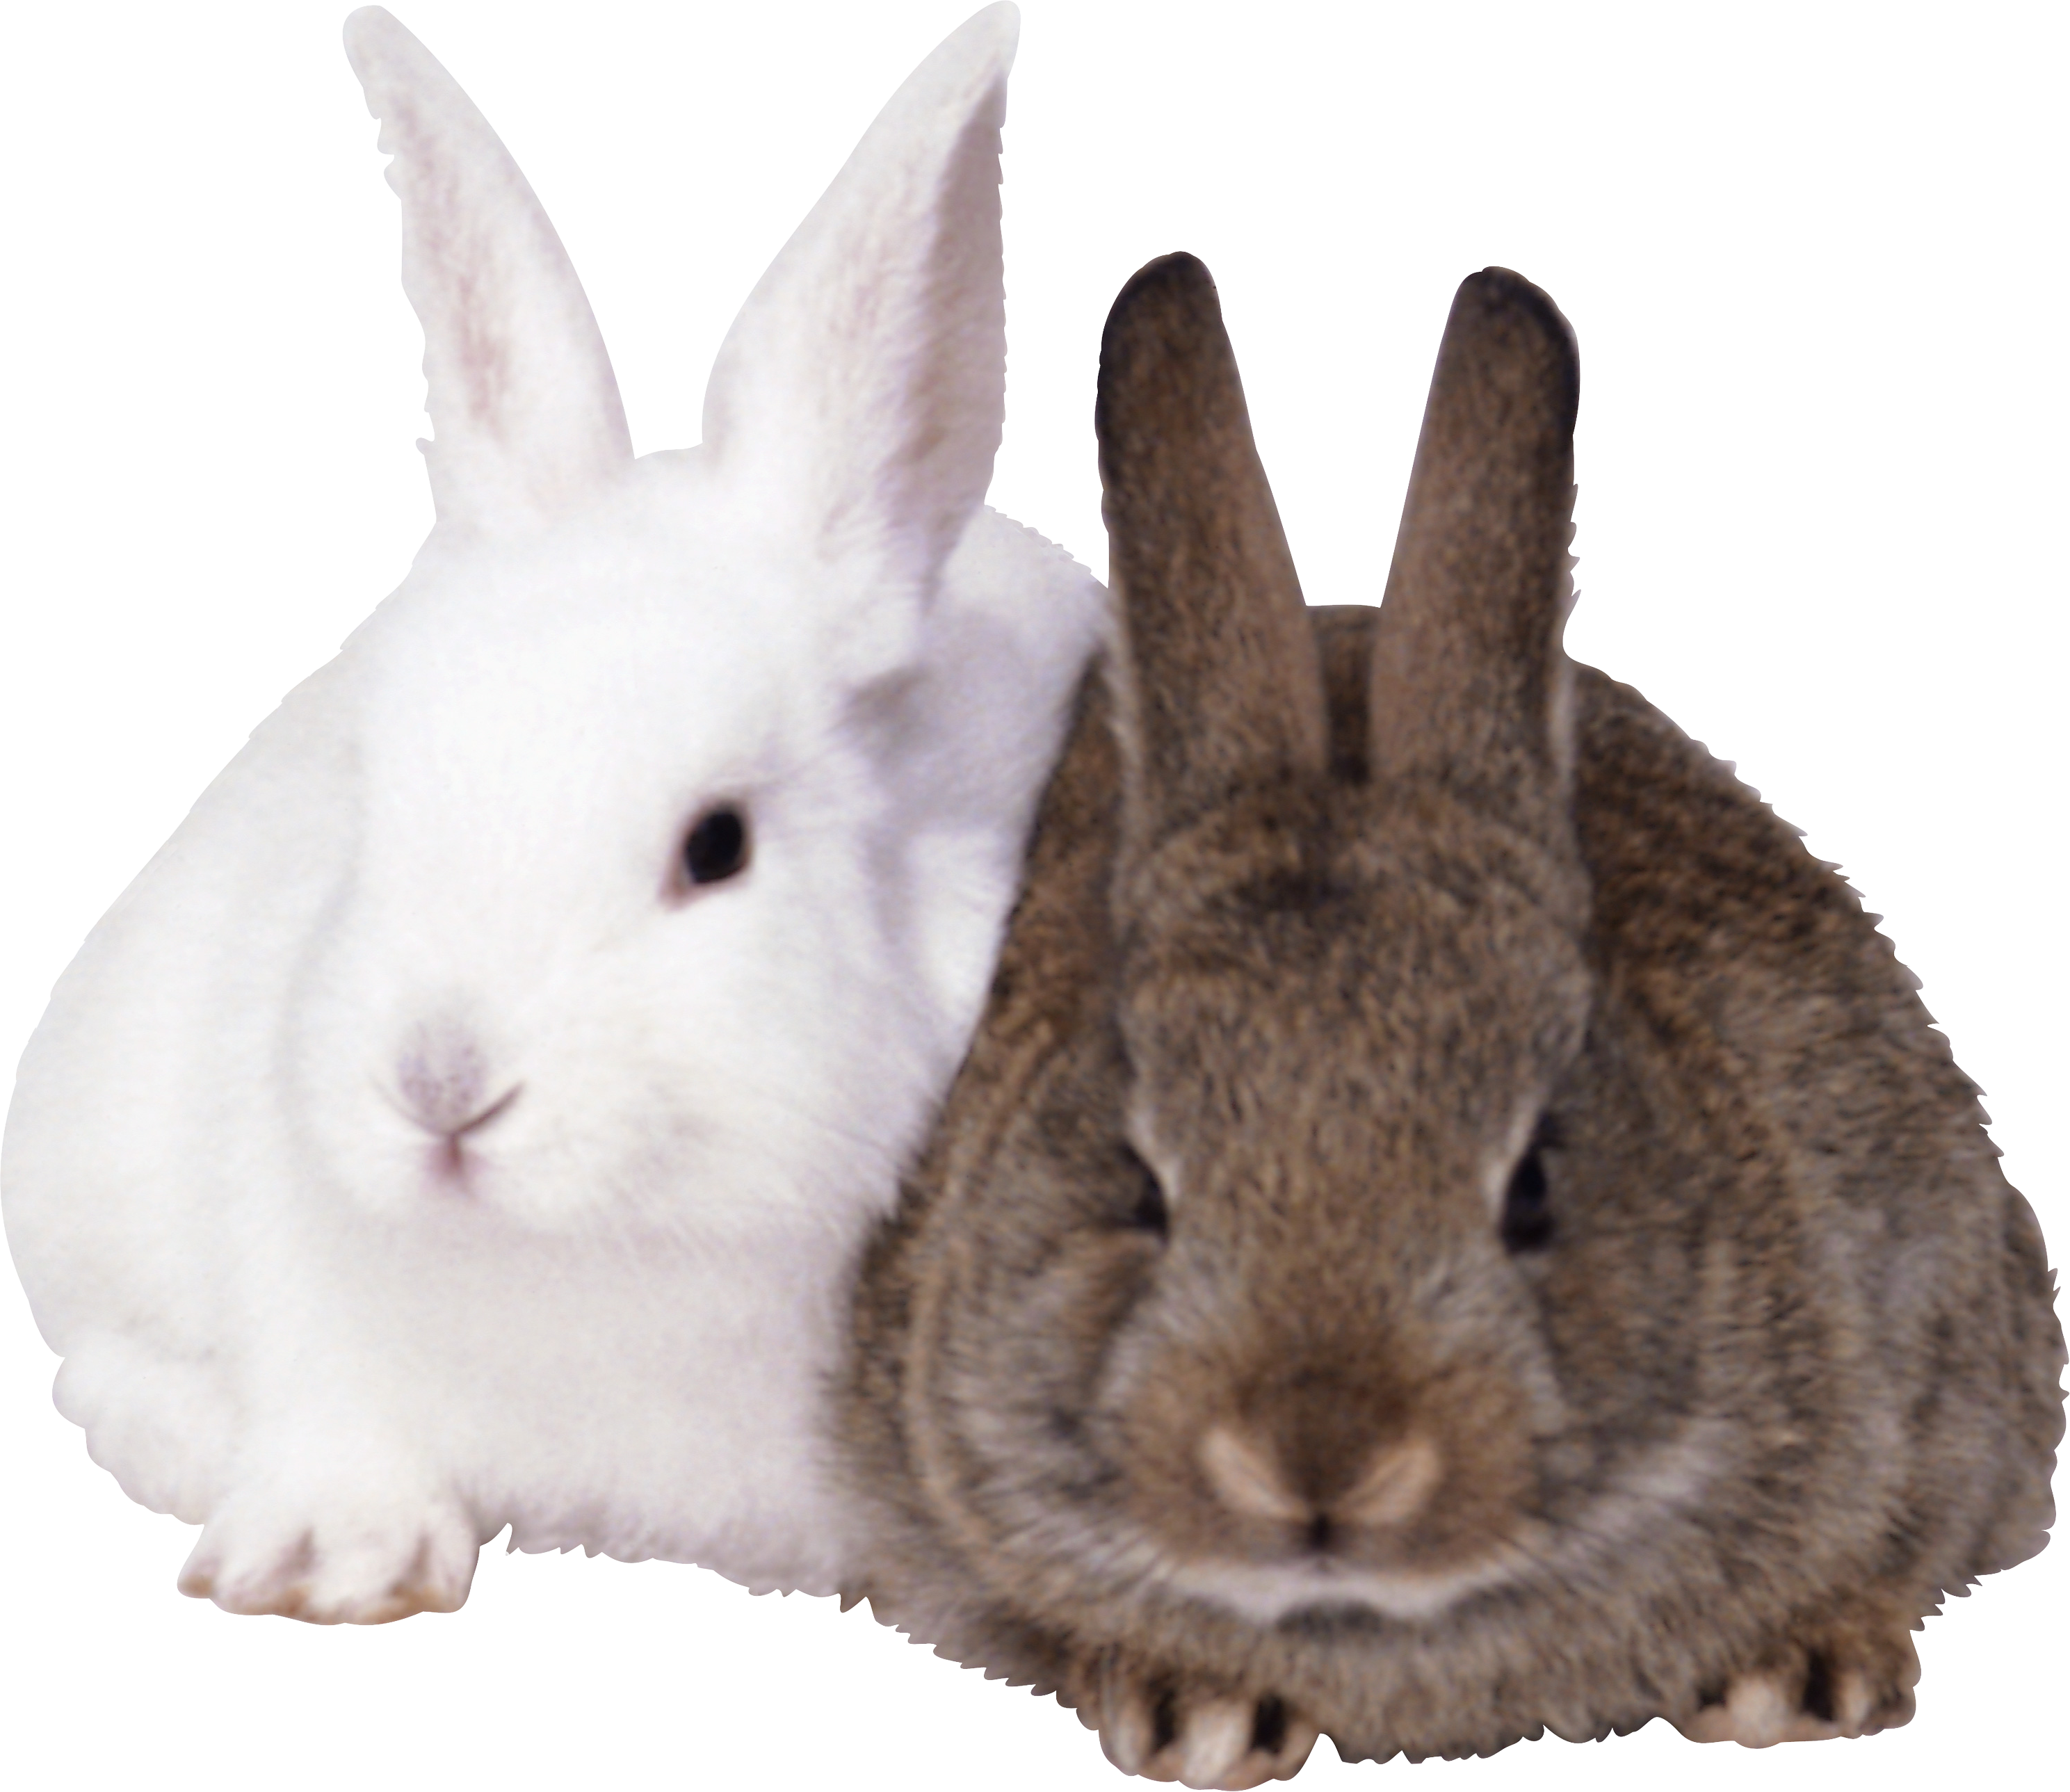 Rabbits Png - Rabbit, Transparent background PNG HD thumbnail